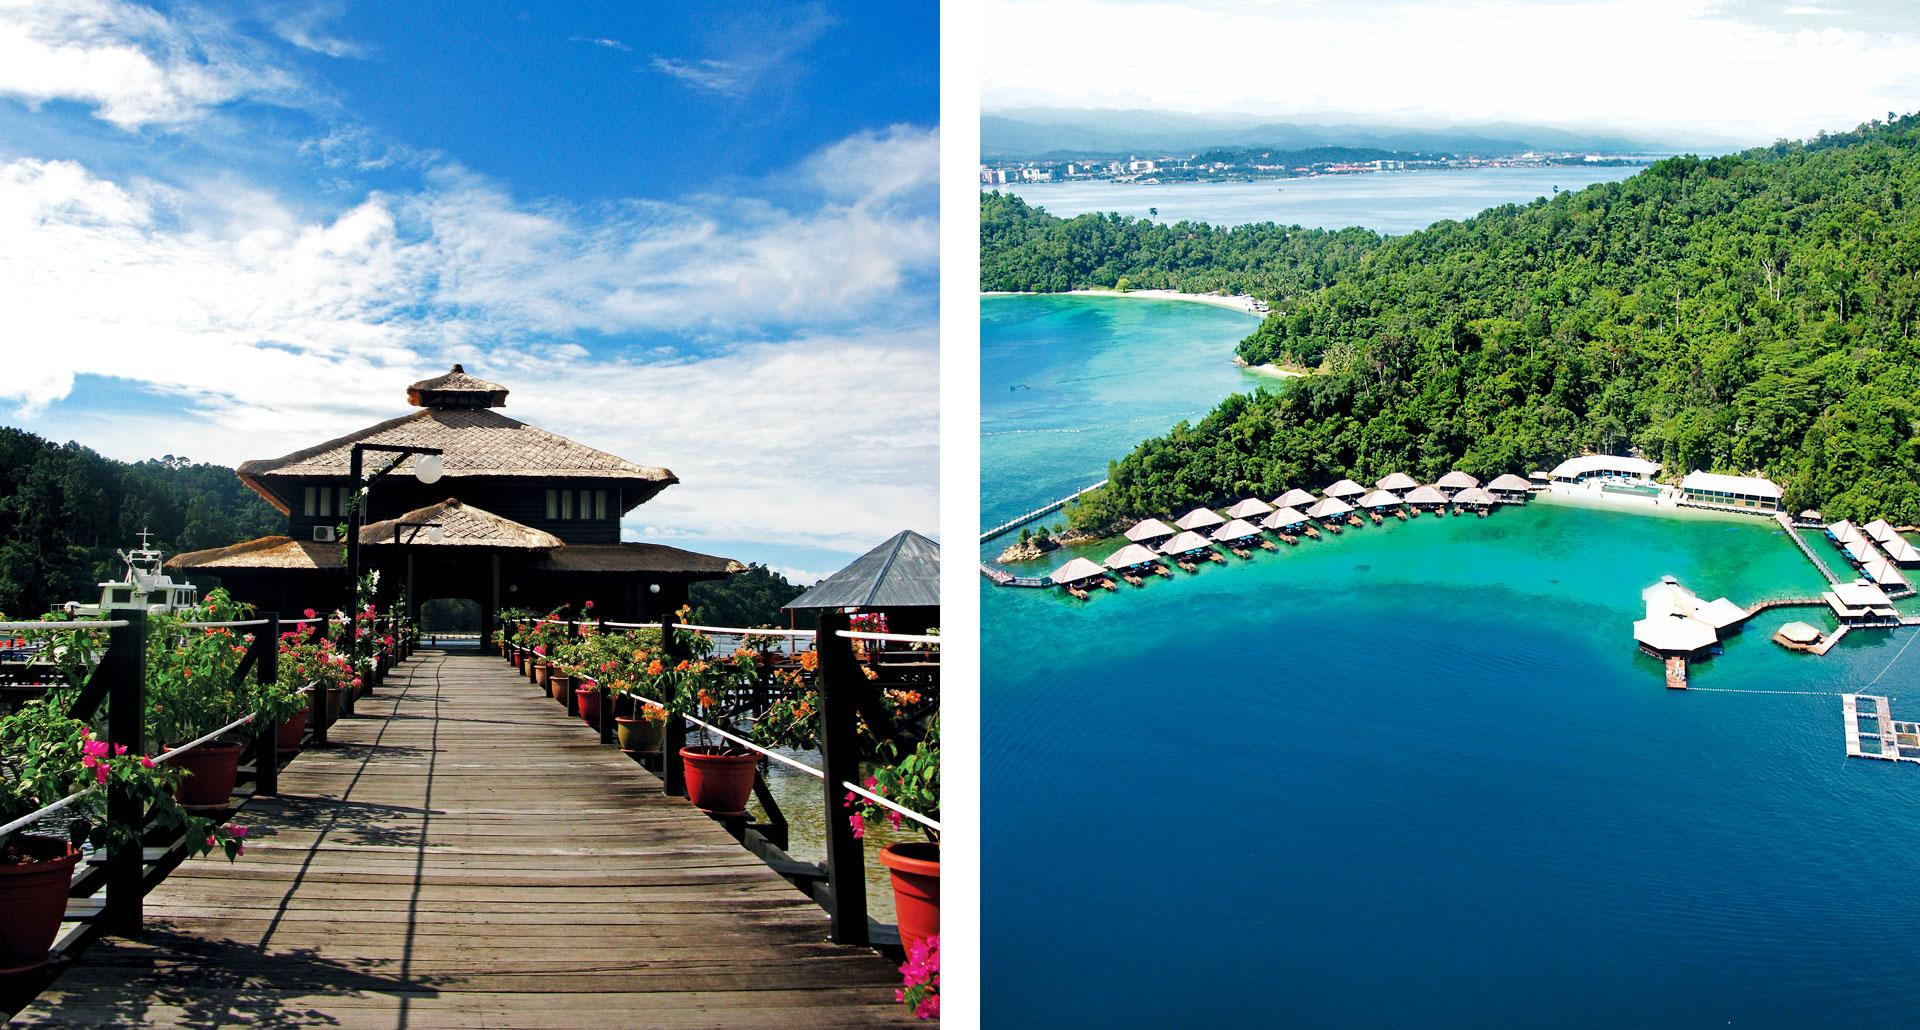 Gayana Eco Resort - boutique hotel in Kota Kinabalu